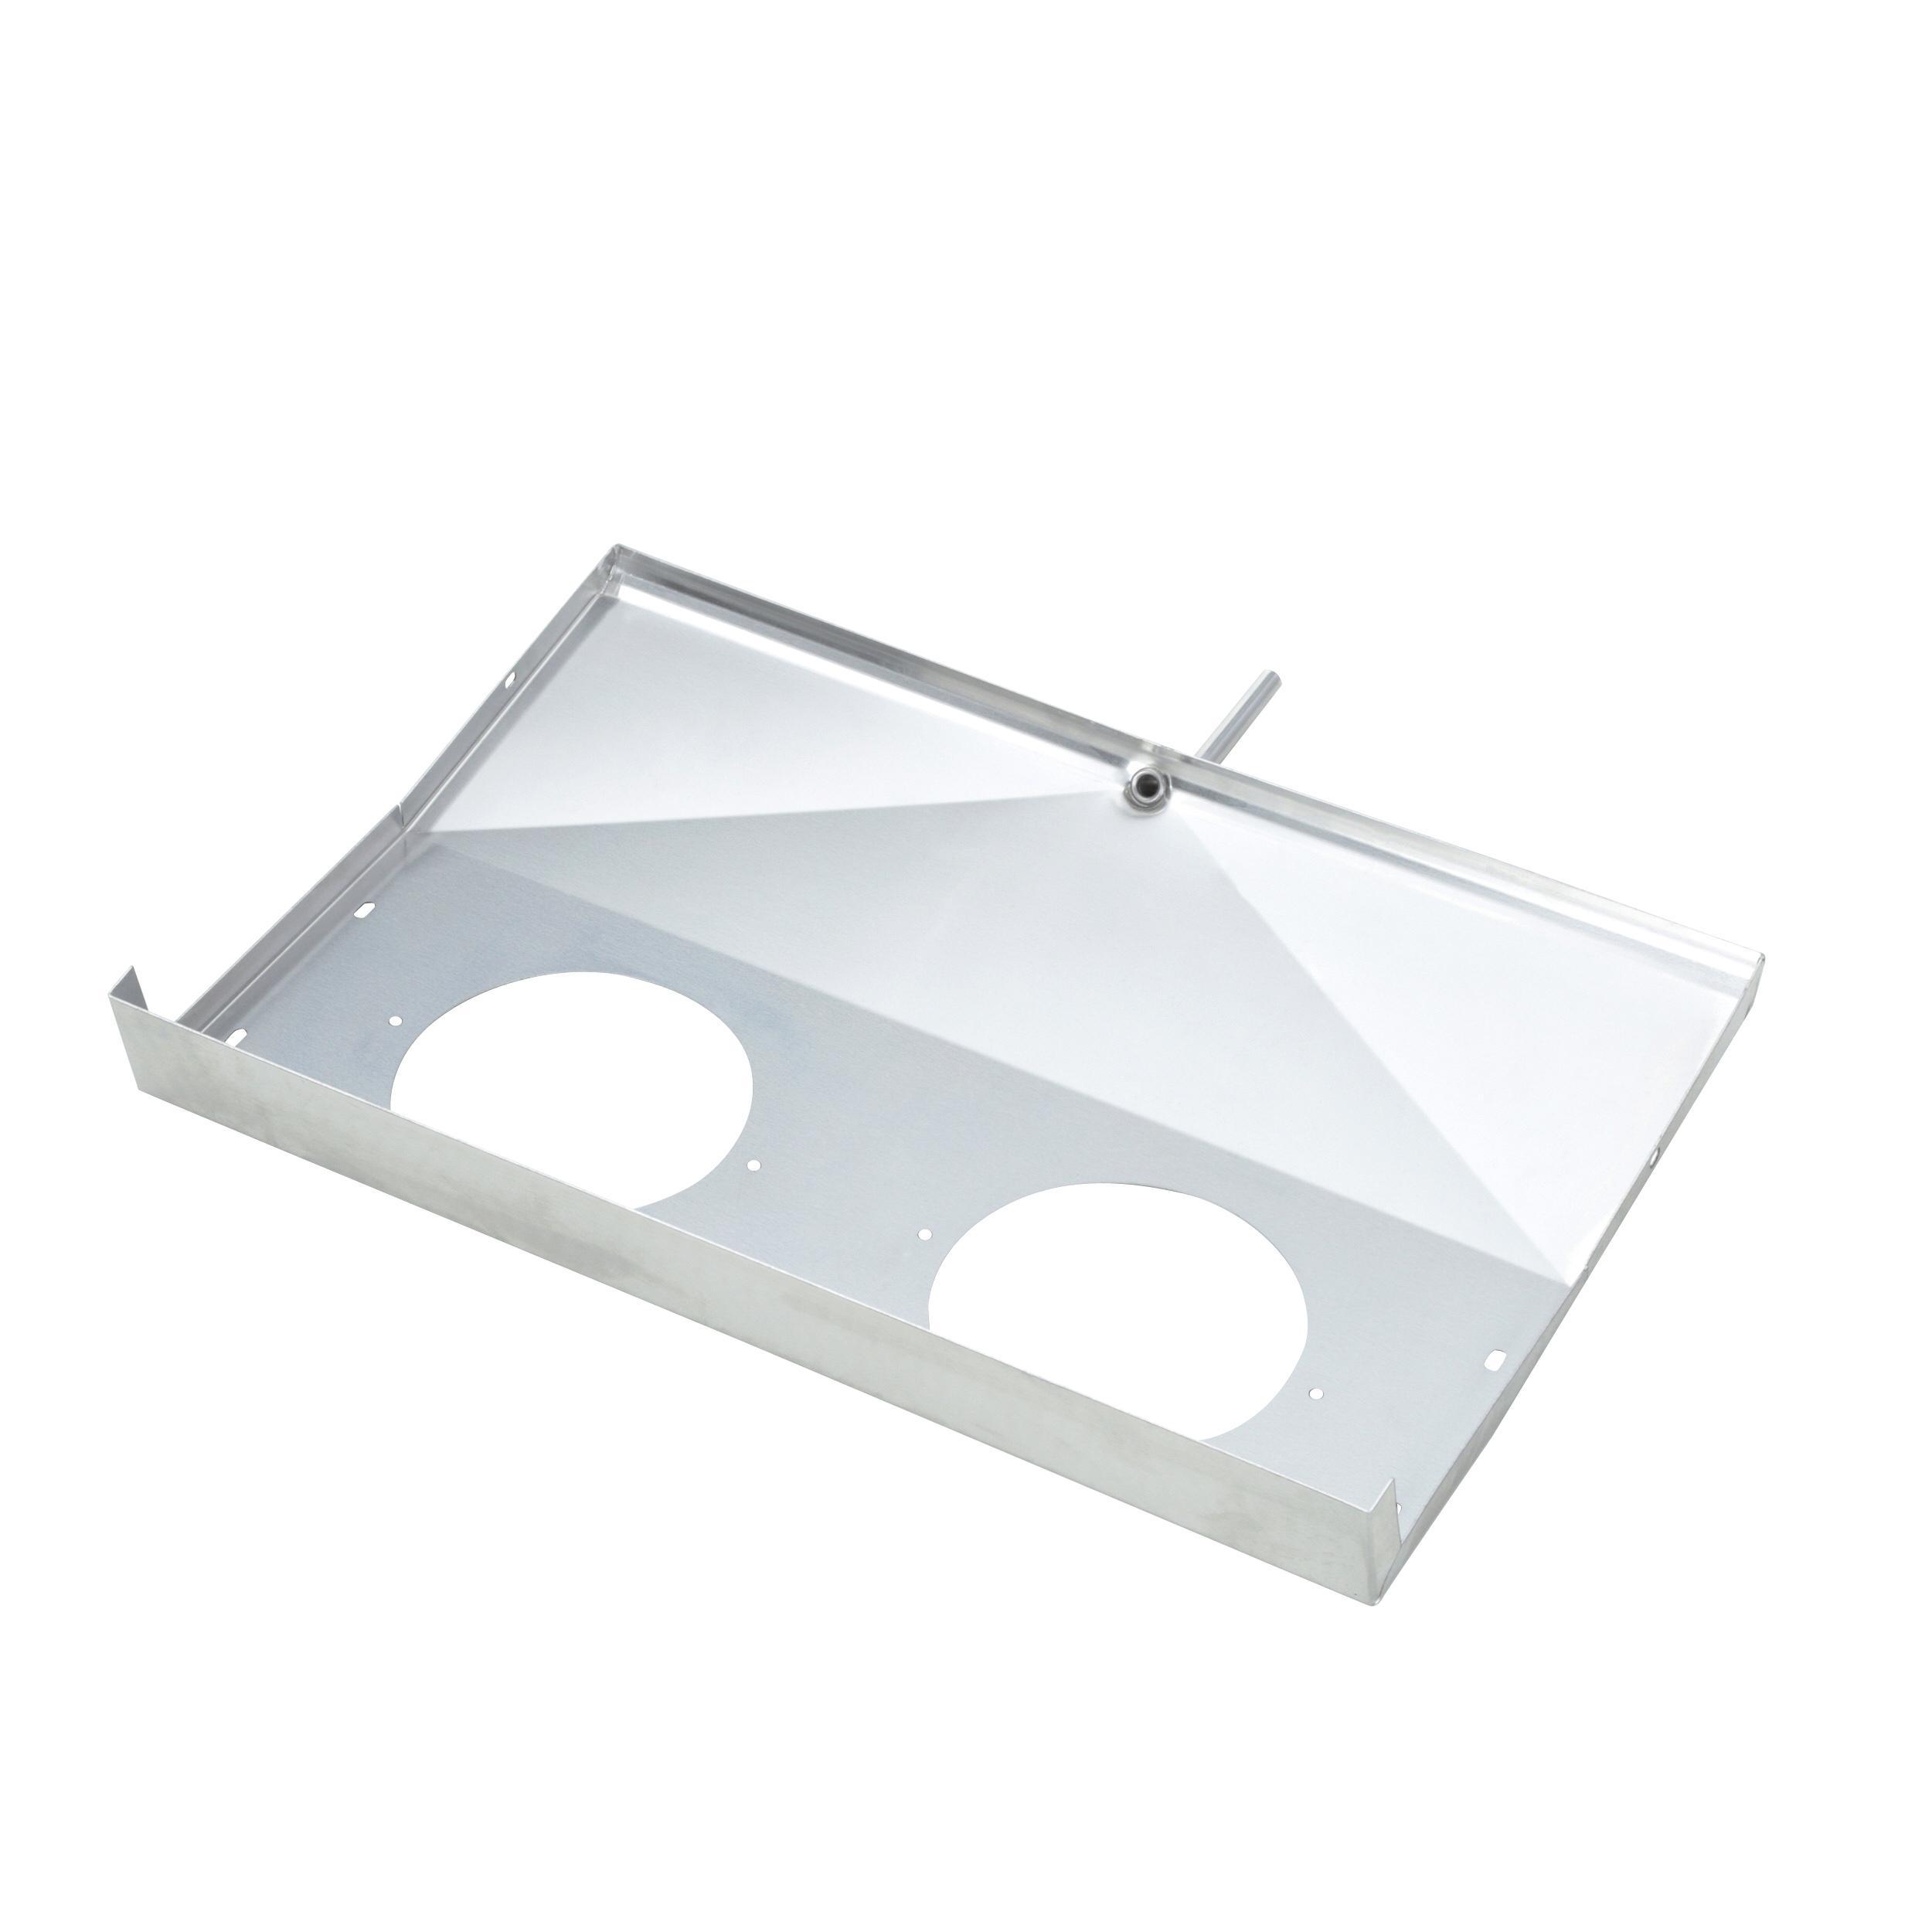 CONTINENTAL REFRIGERATOR COIL HOUSING (EVAP.DRAIN PAN) FOR 2R-SGD